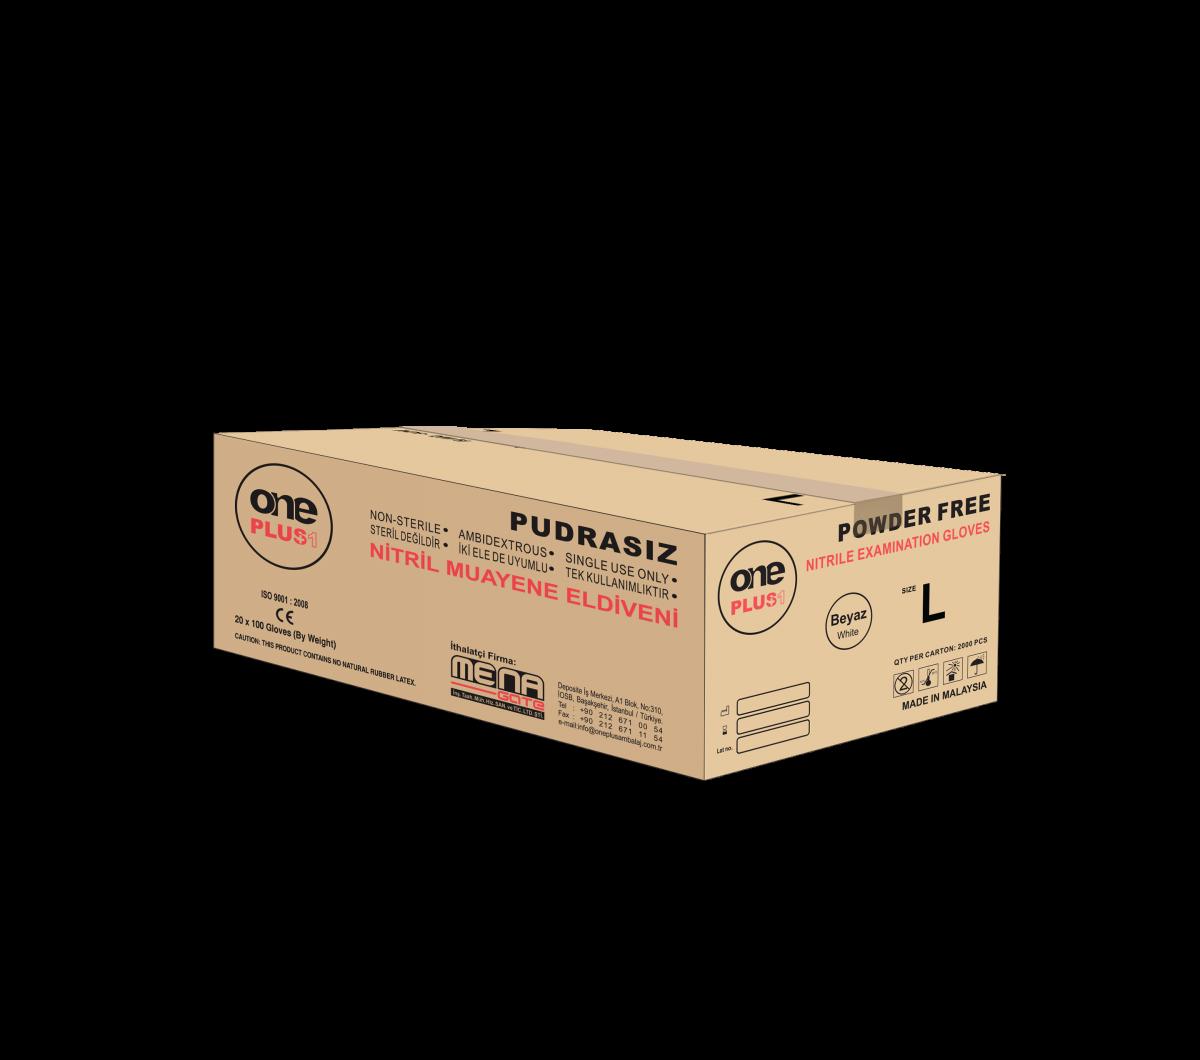 OnePlus Ambalaj Nitril Pudrasiz Muayene Eldiveni Siyah koli (20 paket × 100'lü paket) L